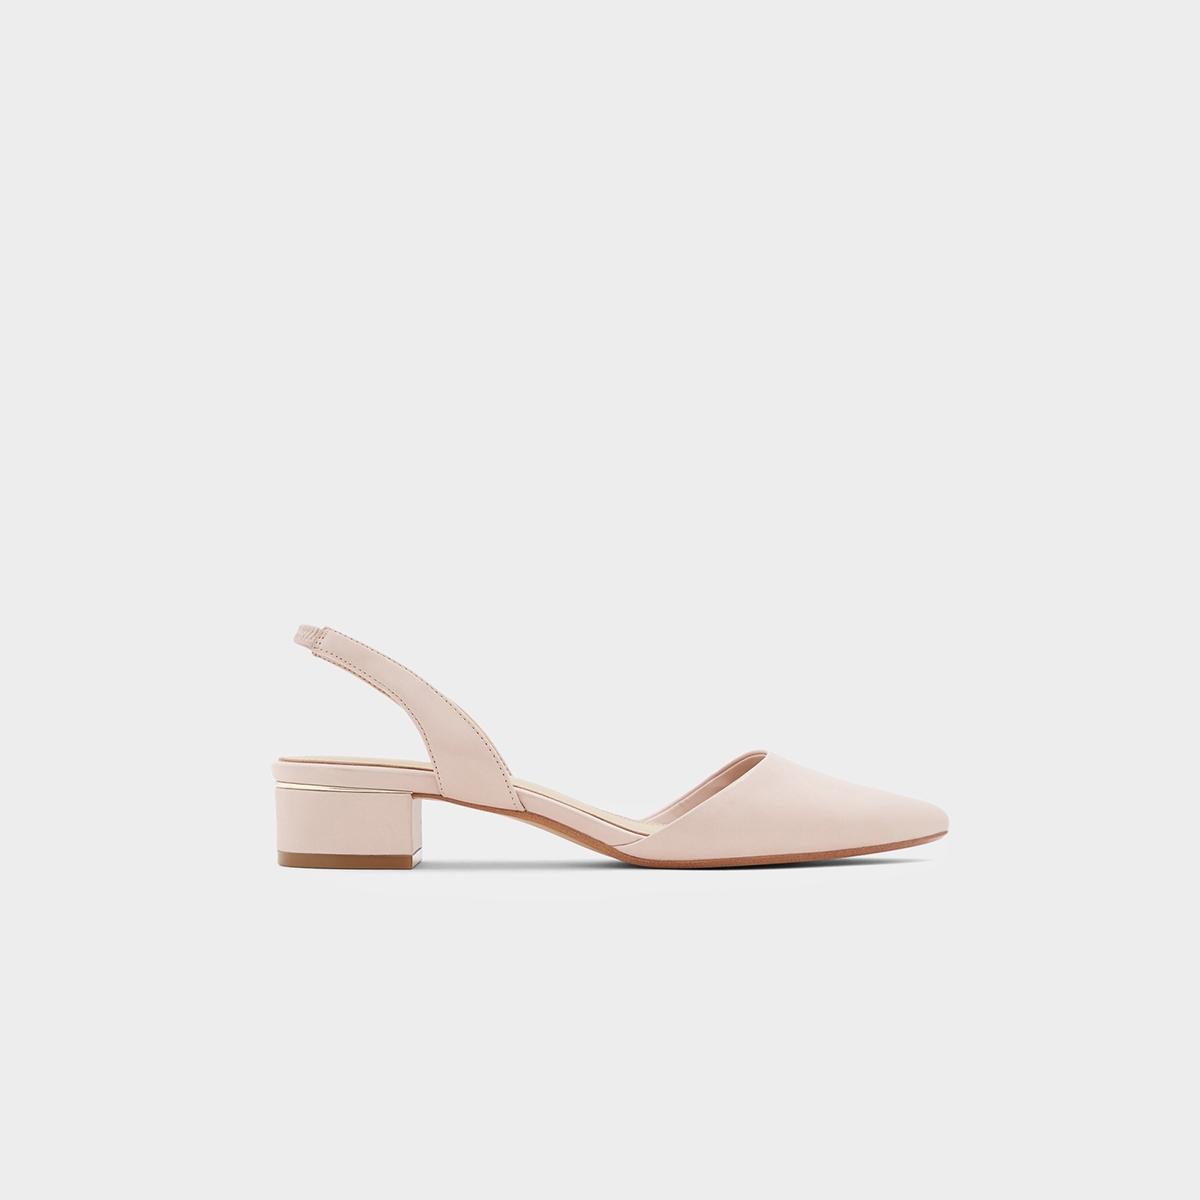 Aldo Anathana Pointed Toe Sandals Nude